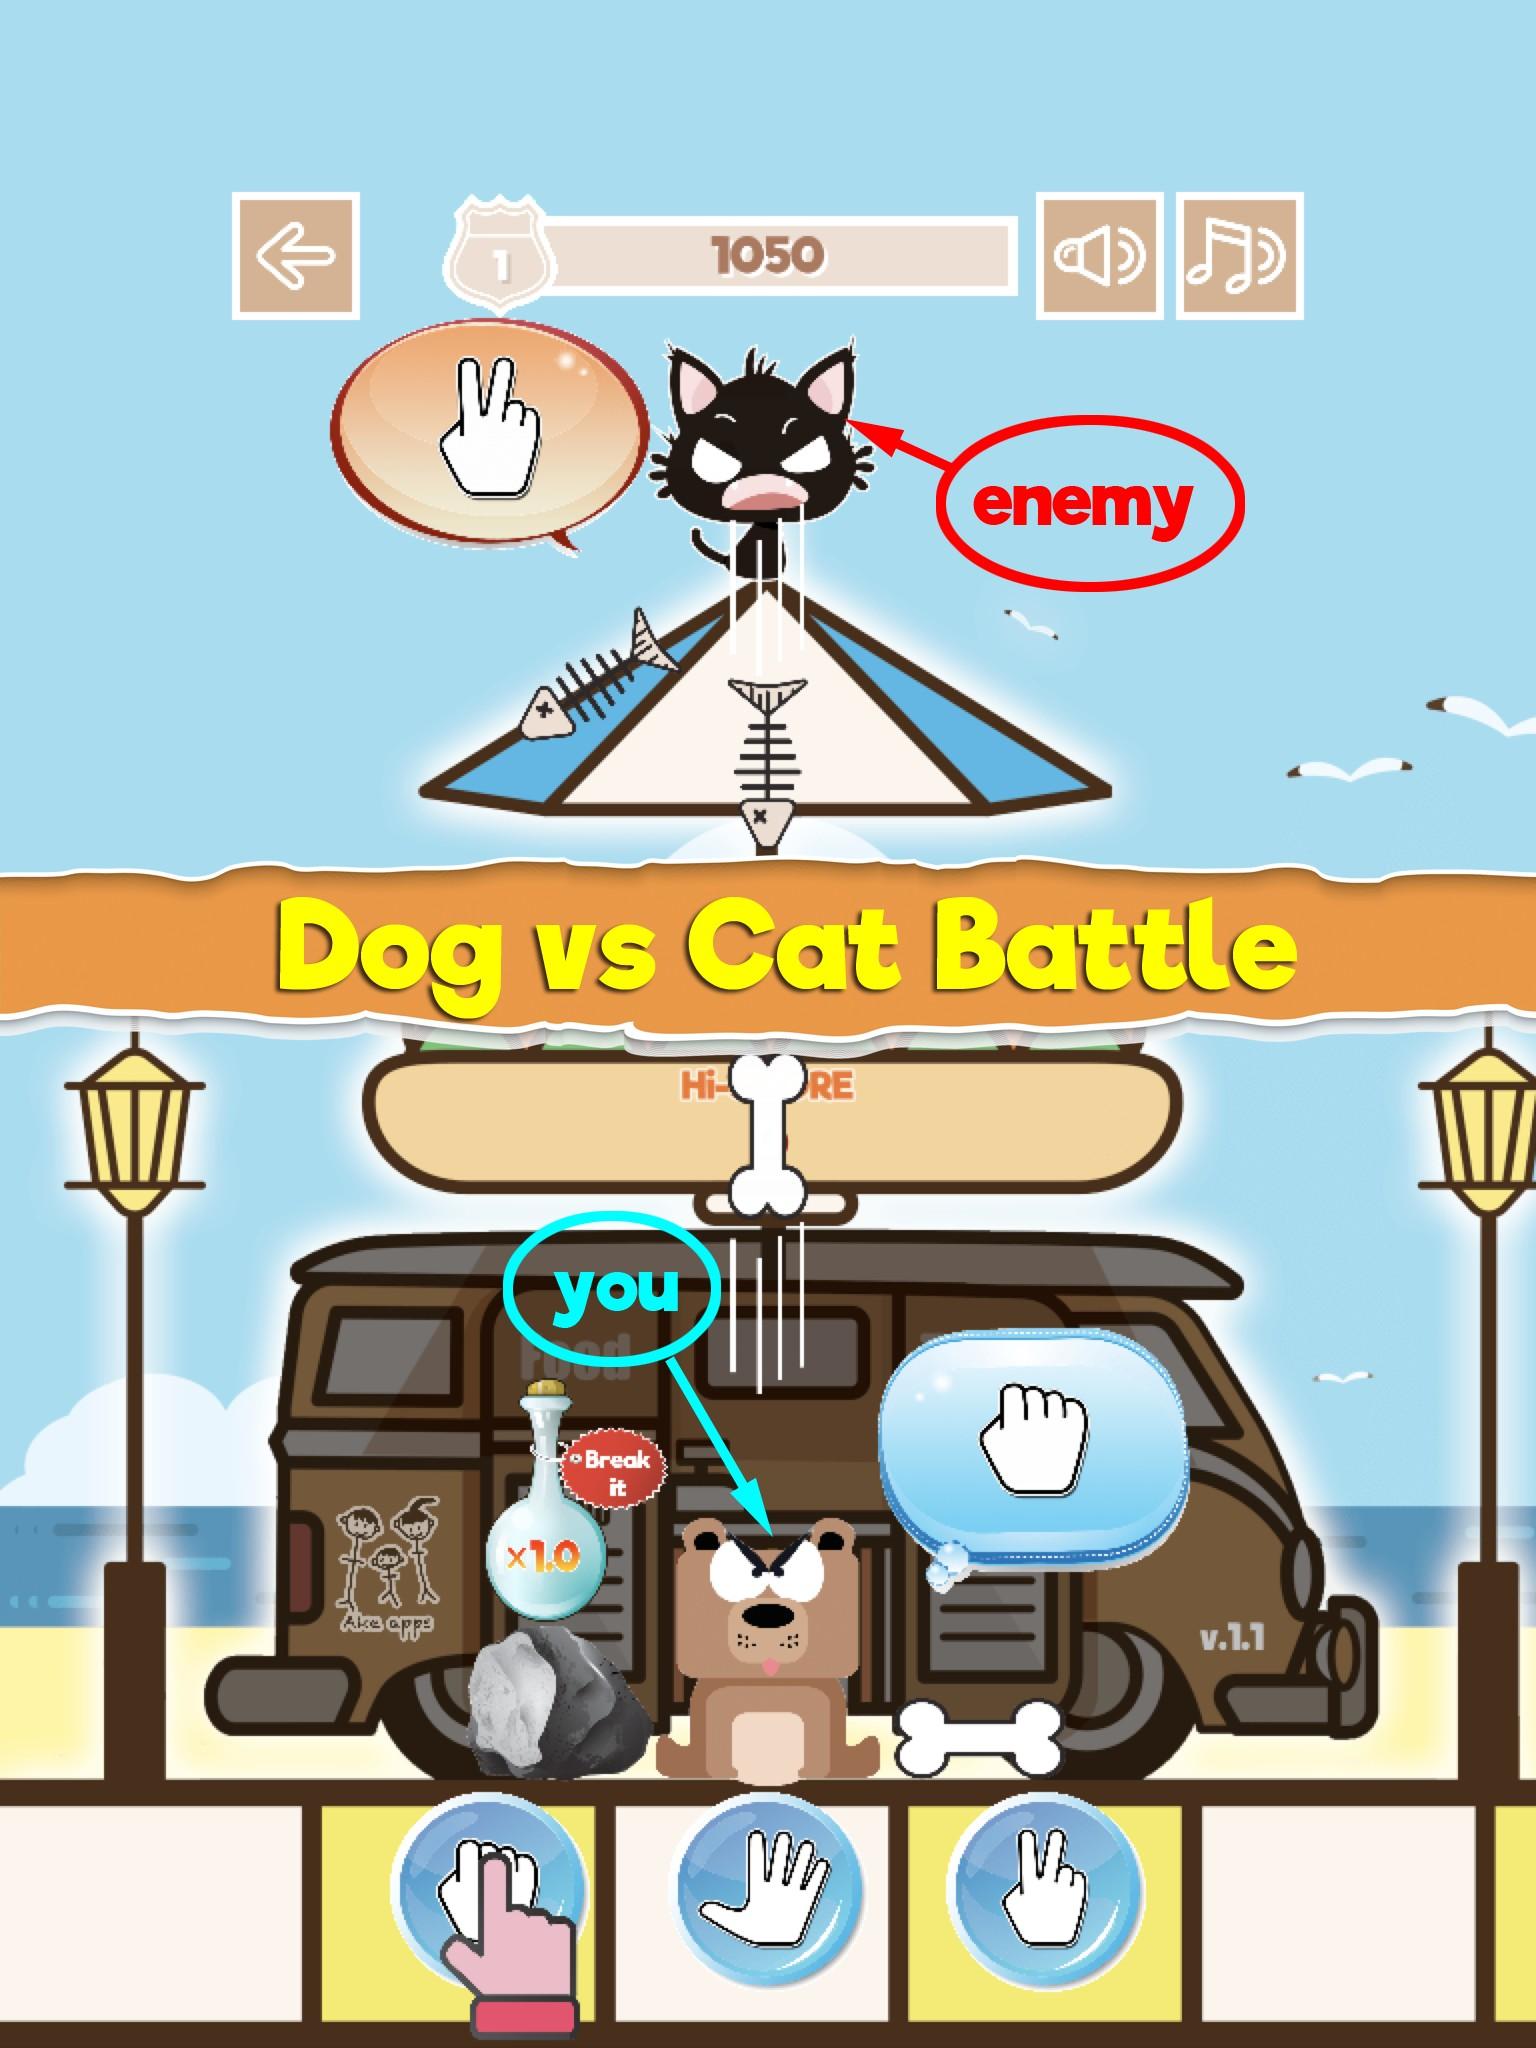 Dog vs Cat RPS Battle